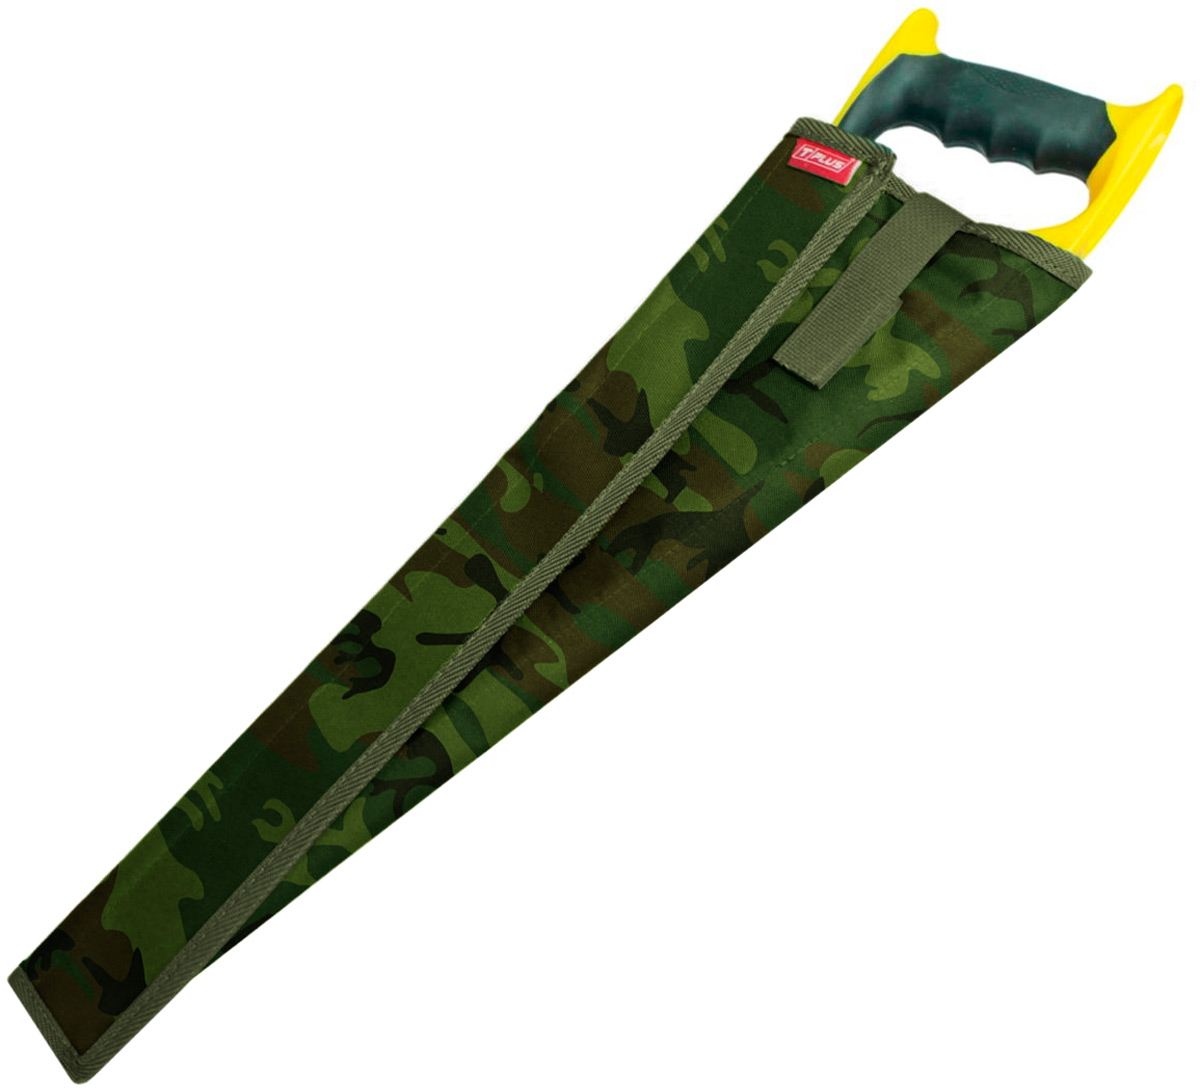 Чехол для ножовки Tplus, оксфорд 600, цвет: нато, 40 см